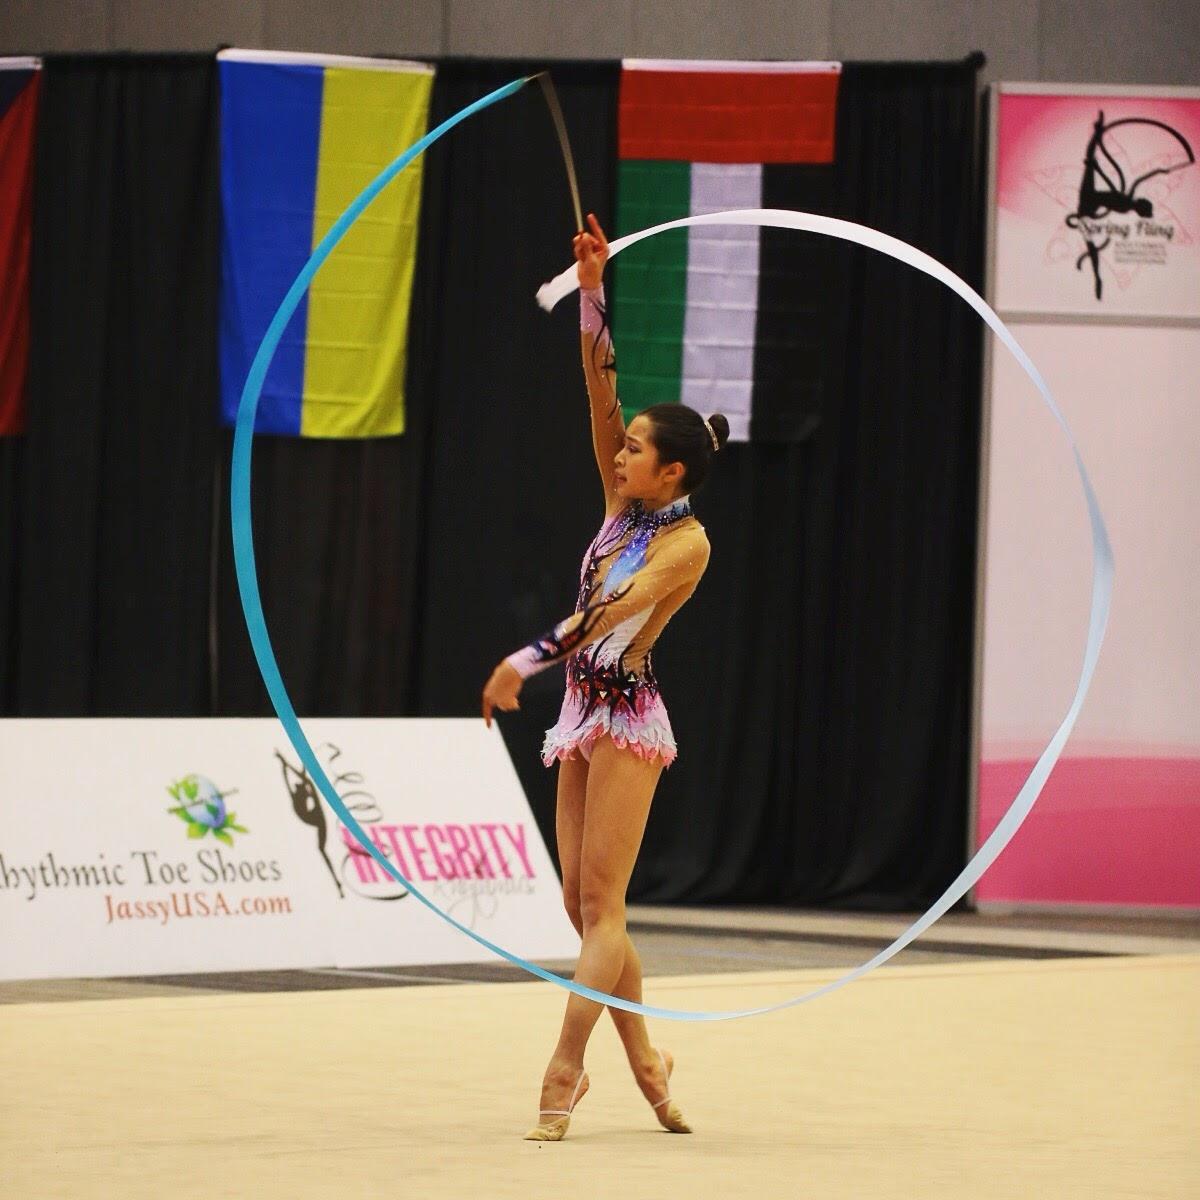 Kristen rhythmic gymnastics 2